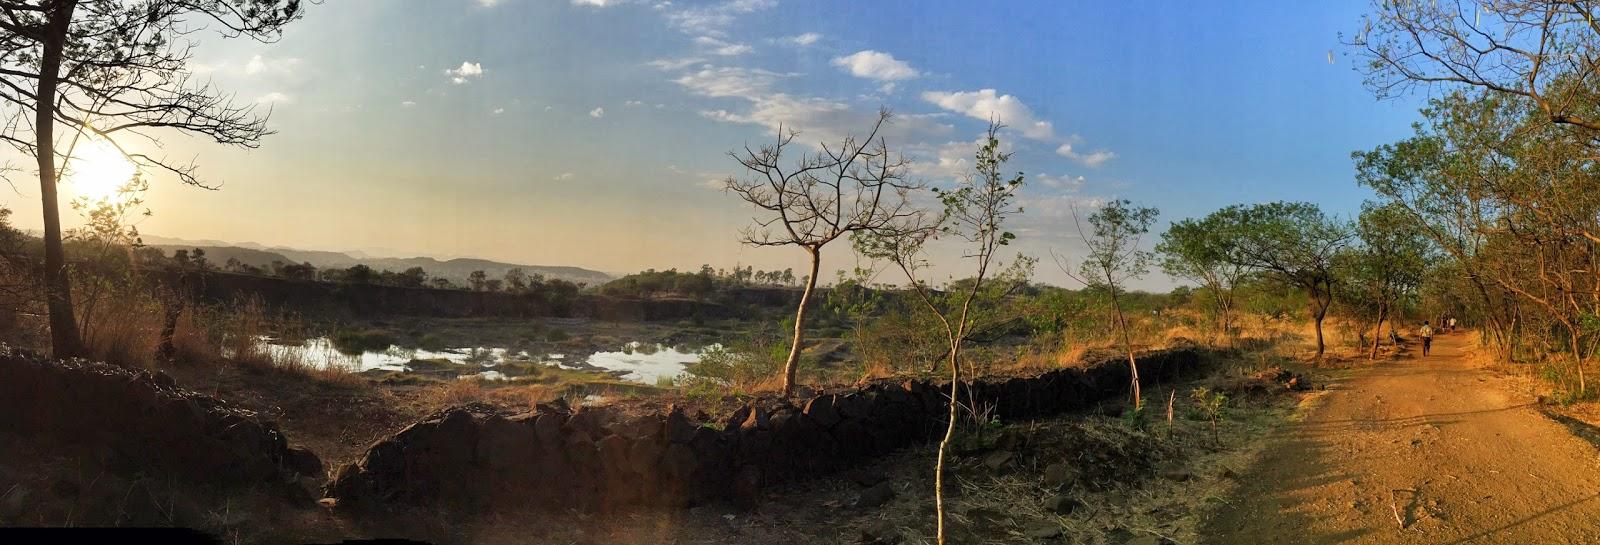 Vetal Hill Pune panorama picture image crater sunset beautiful walking path lane